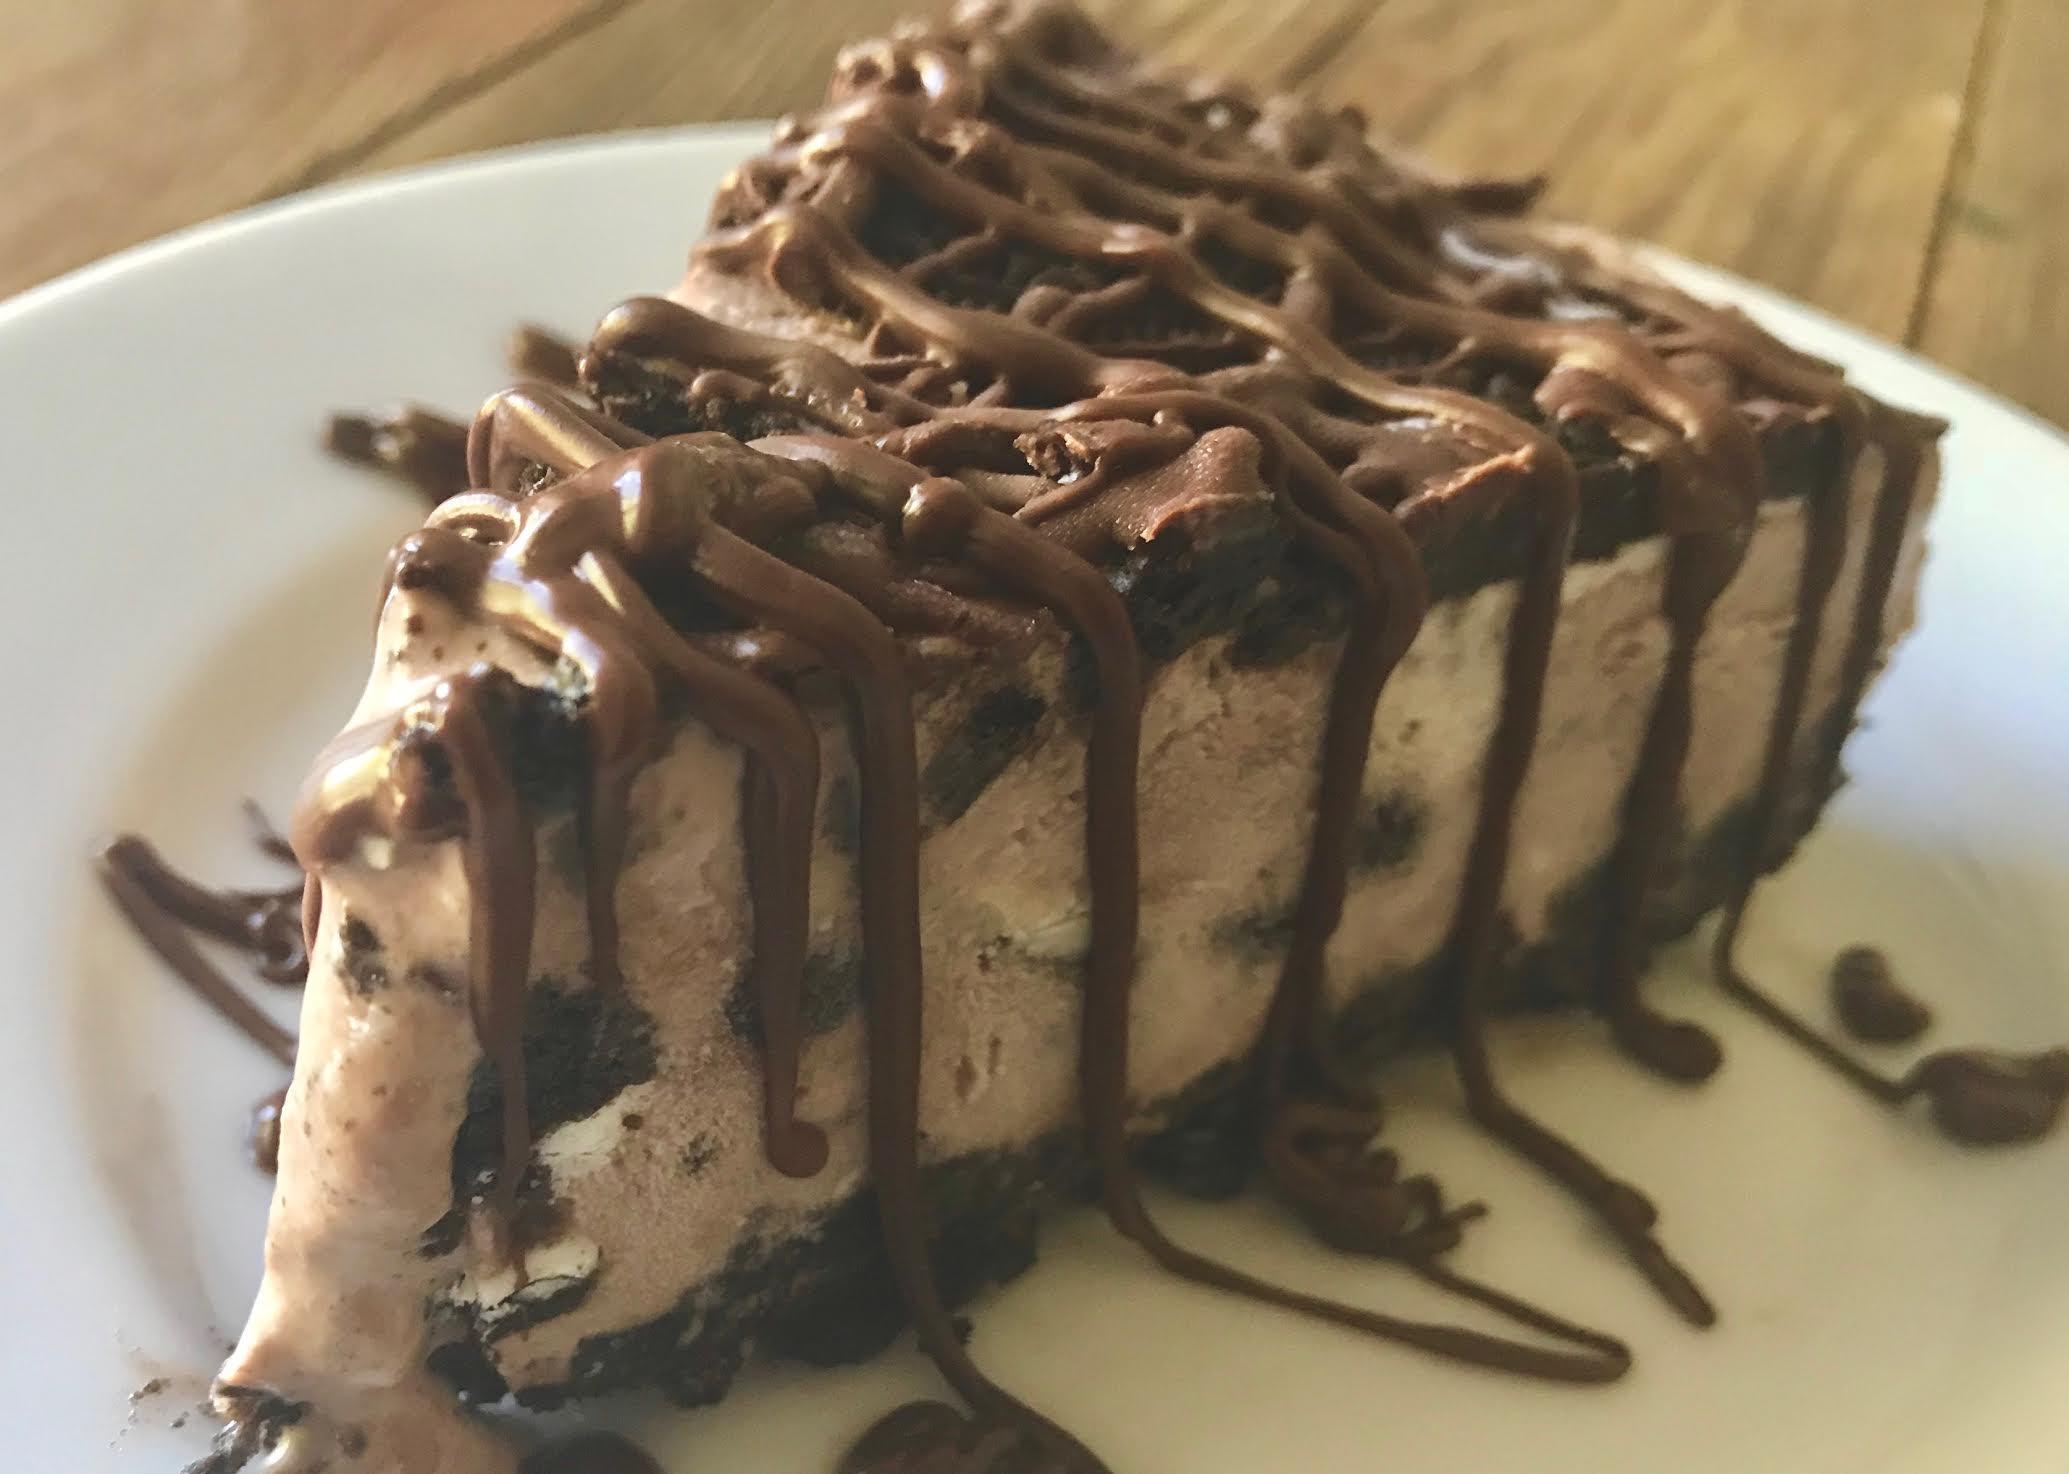 Jeffs Chocolate Cookies Ice Cream Cheesecake No Bake Inspired By The Wawa Drink